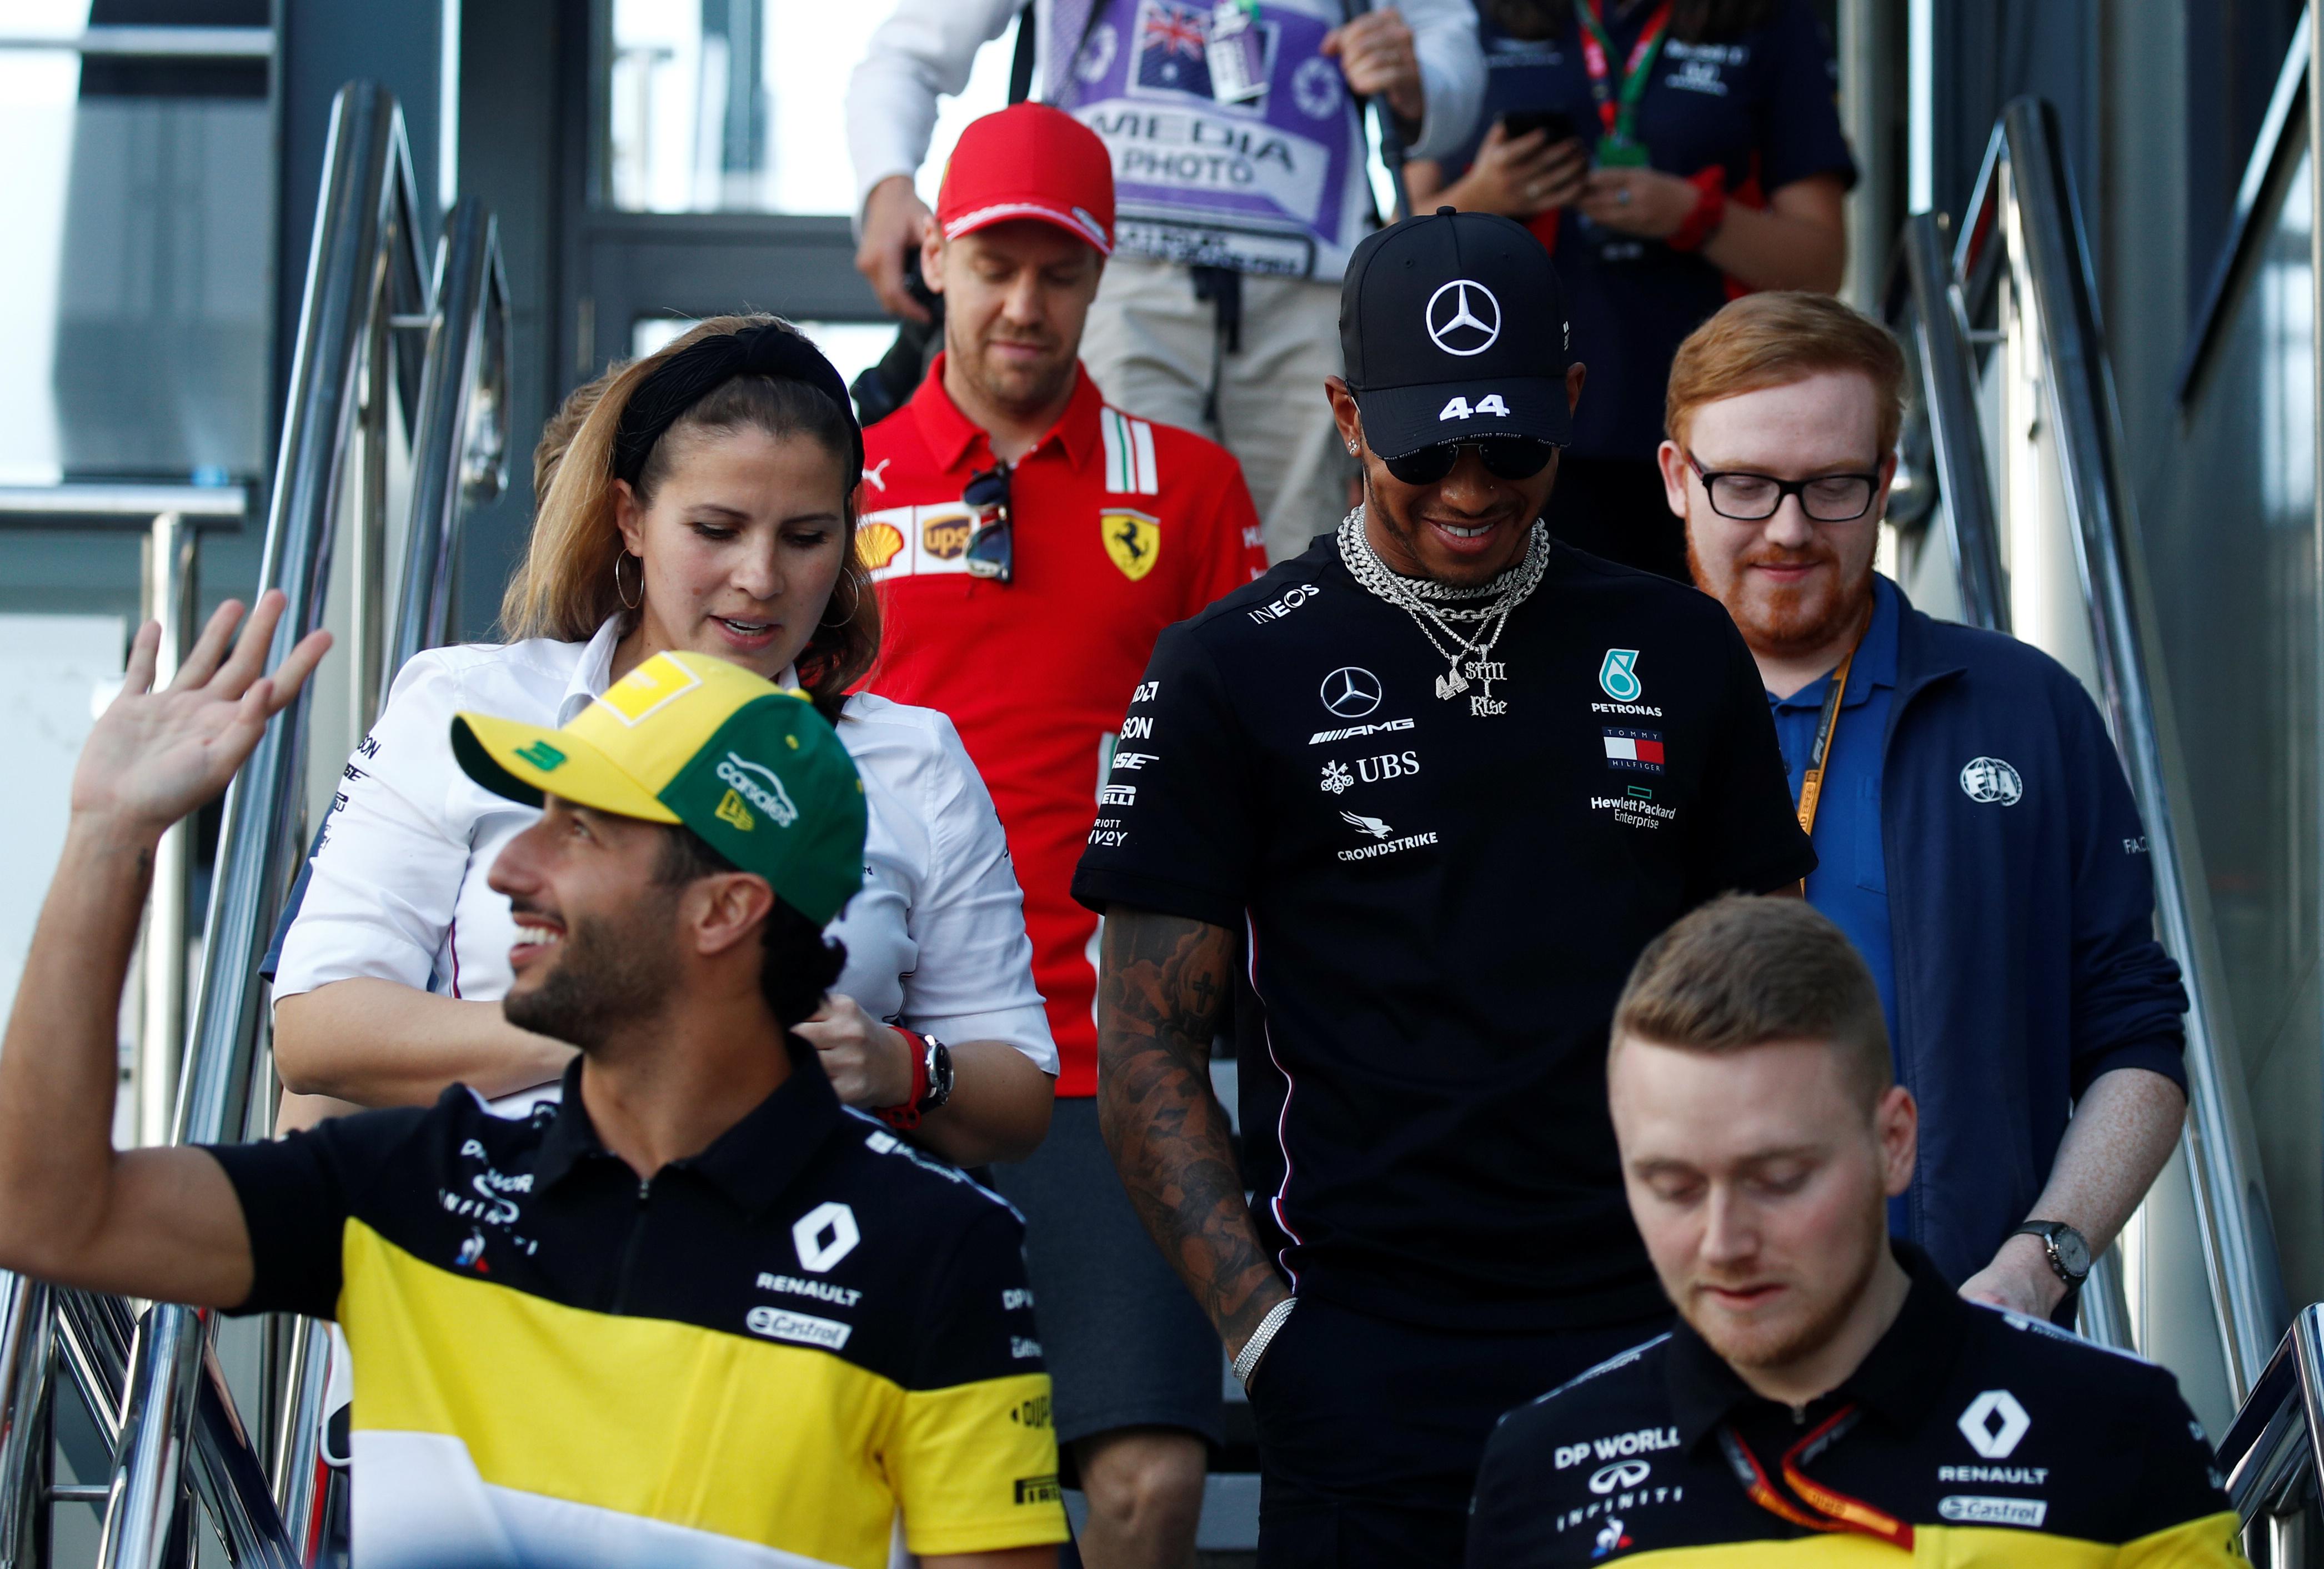 Formula One F1 - Australian Grand Prix - Melbourne Grand Prix Circuit, Melbourne, Australia - March 12, 2020 Mercedes' Lewis Hamilton, Renault's Daniel Ricciardo and Ferrari's Sebastian Vettel after the press conference